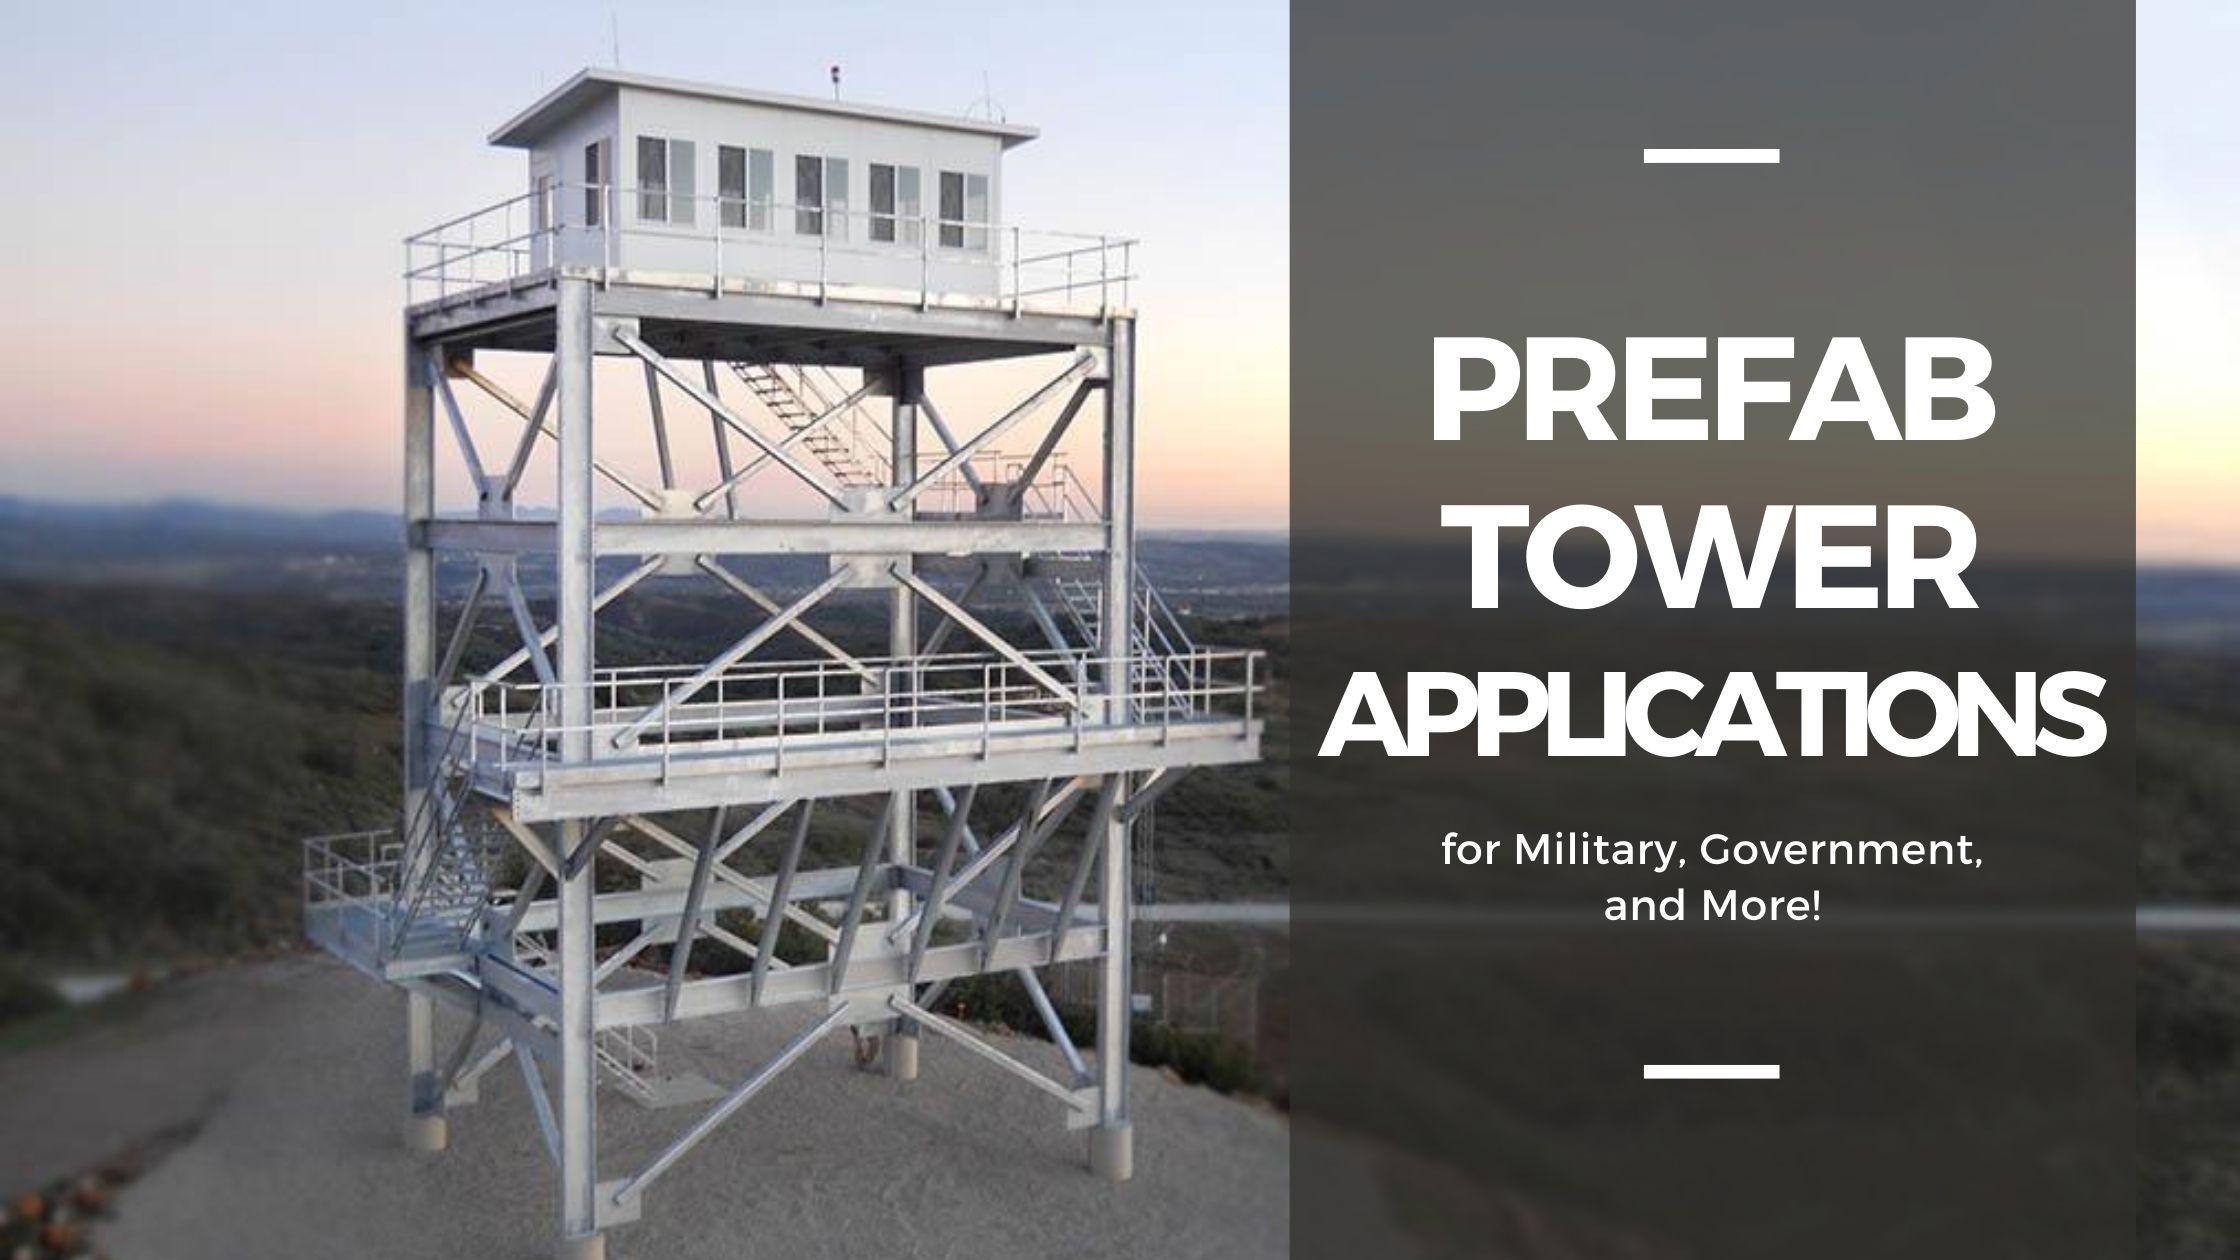 Prefab Tower Applications